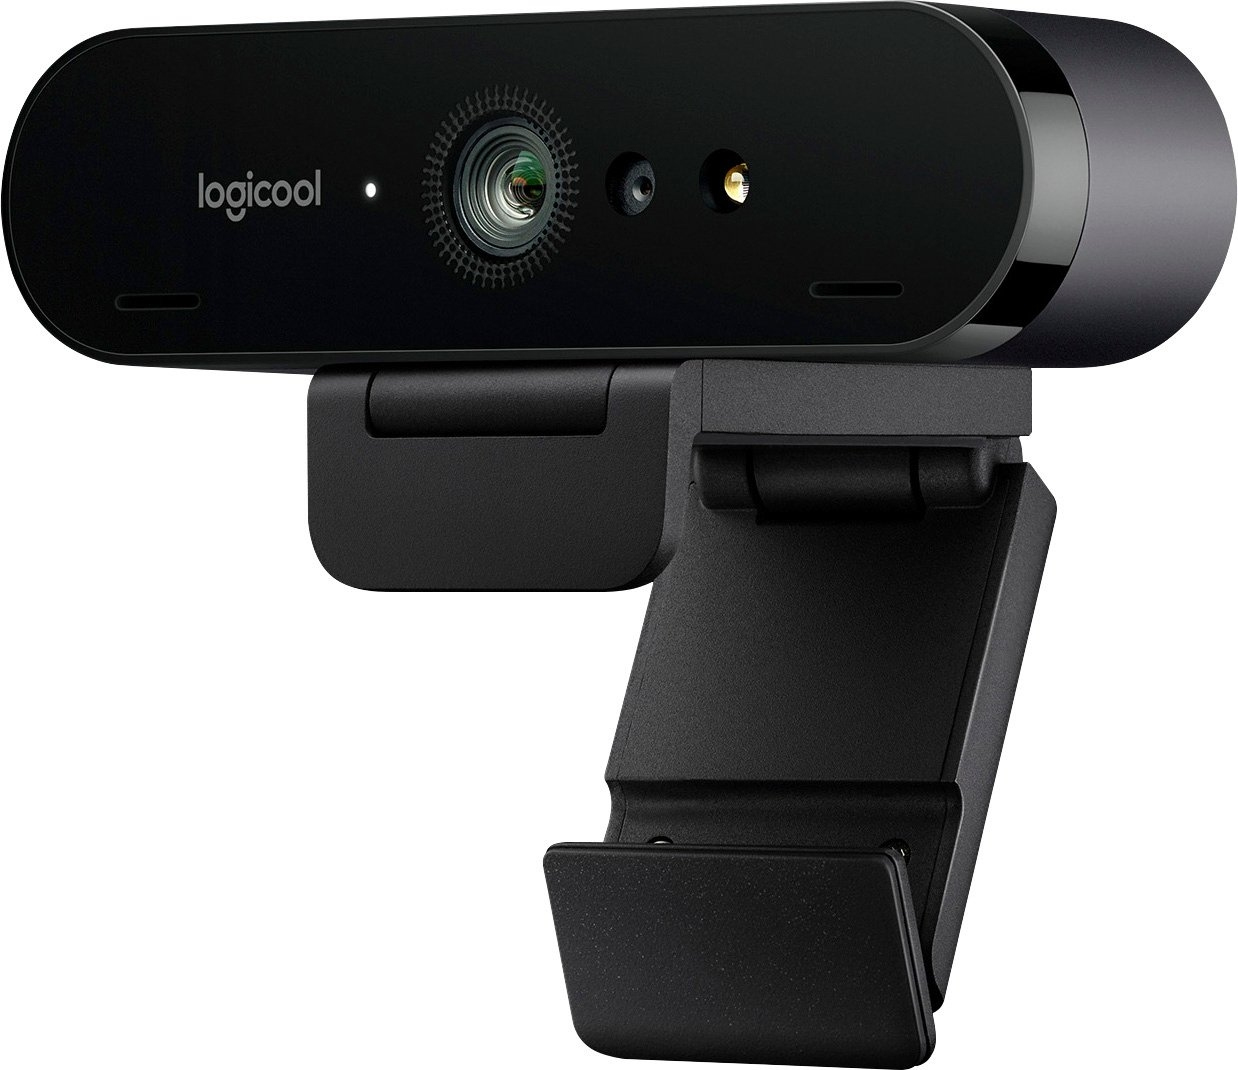 Logitech »BRIO 4K STREAM EDITION« webcam nu online kopen bij OTTO